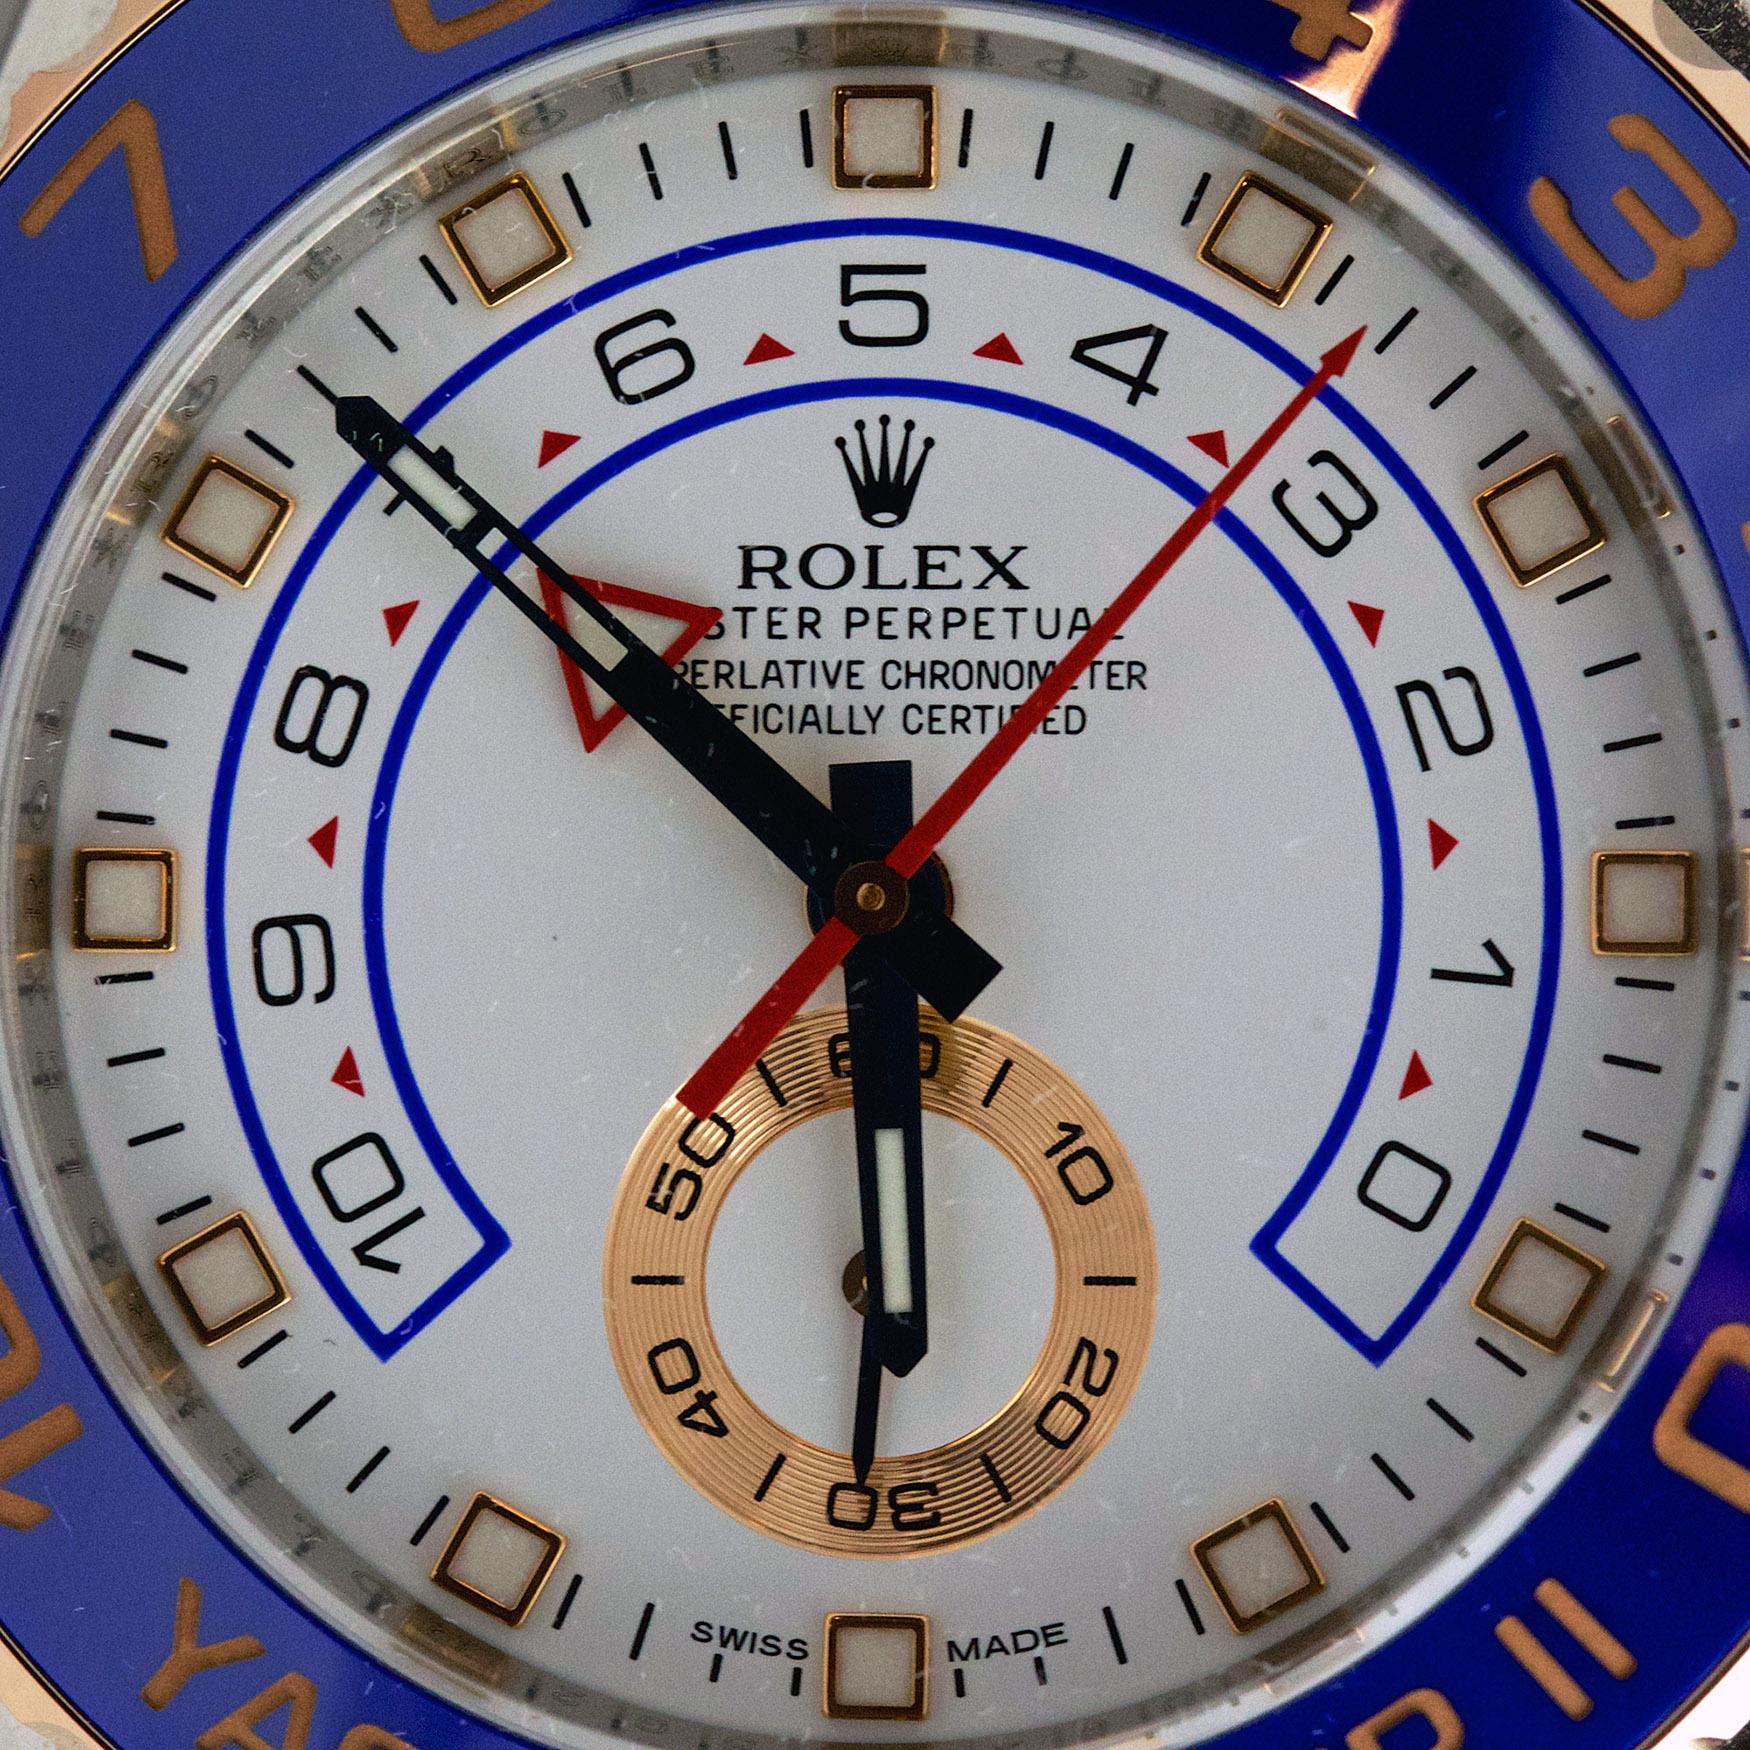 Rolex Yacht-Master II (Ref. 116681)  - Dial